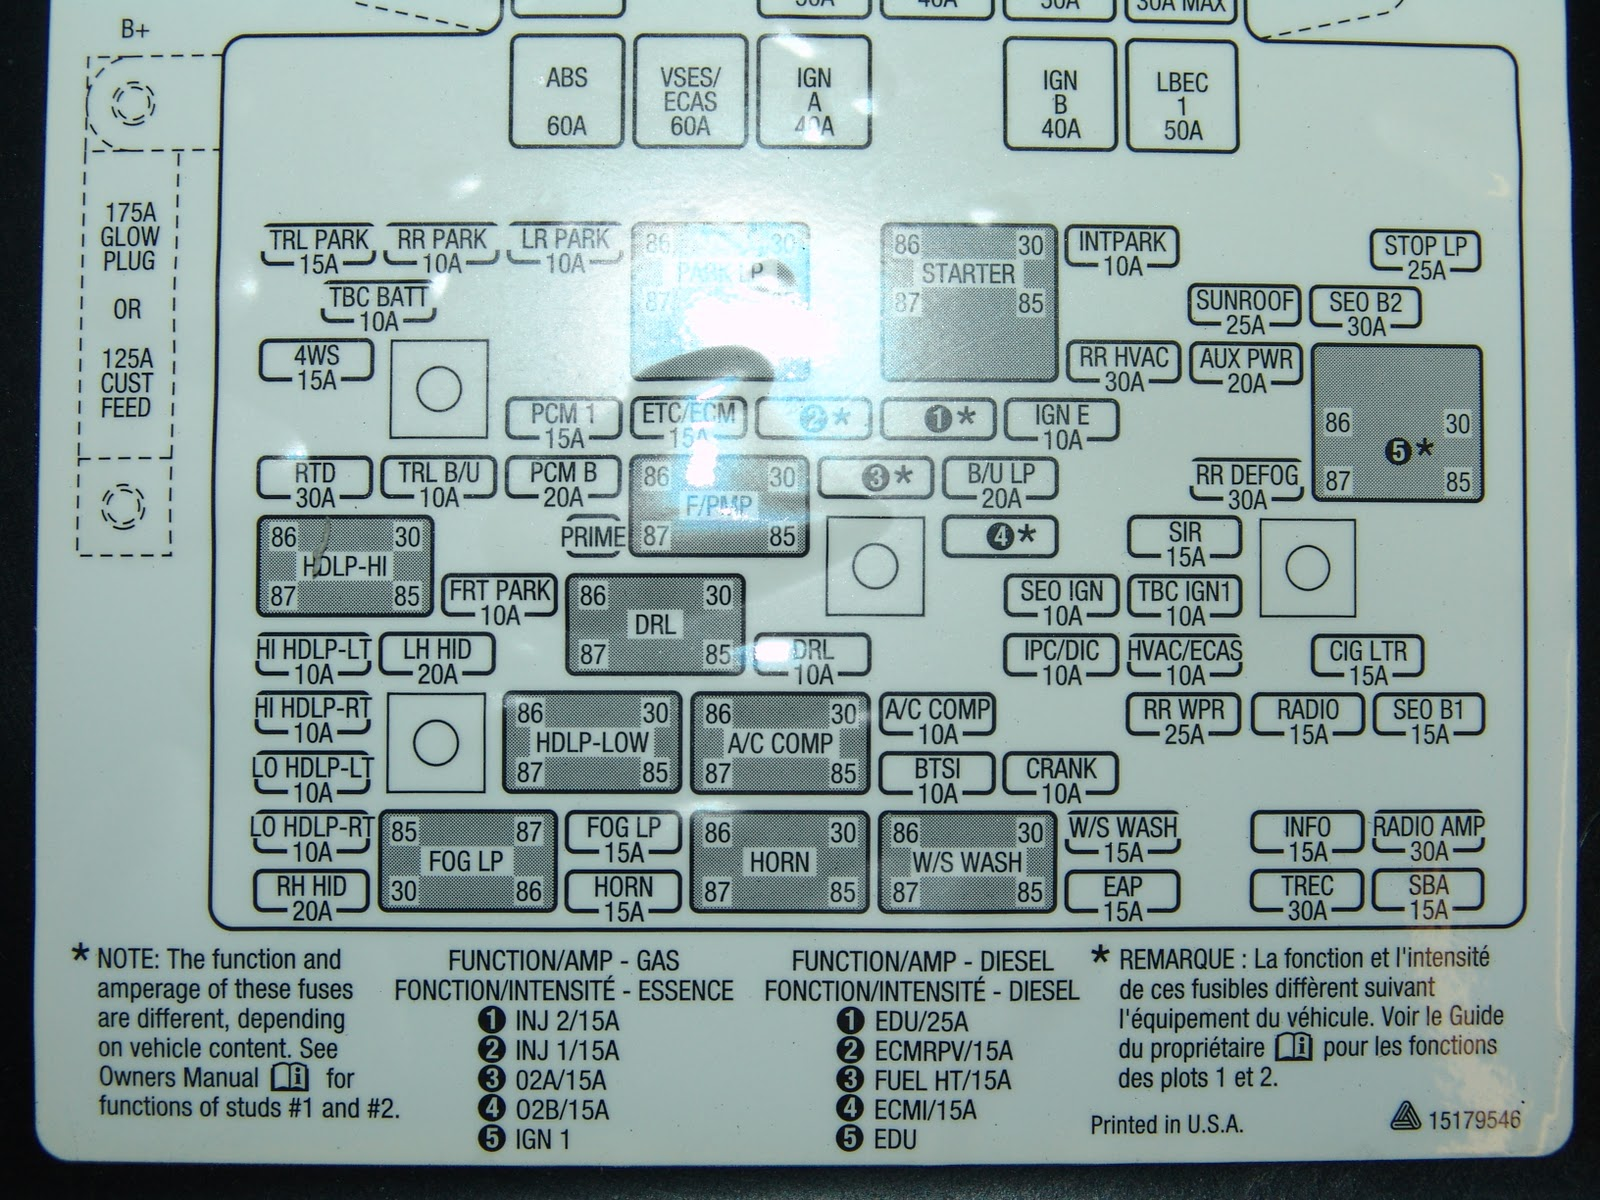 1999 Silverado Fuse Diagram Wiring Library 99 Suburban Box Panel For 2005 Chevy Aveo Image Details